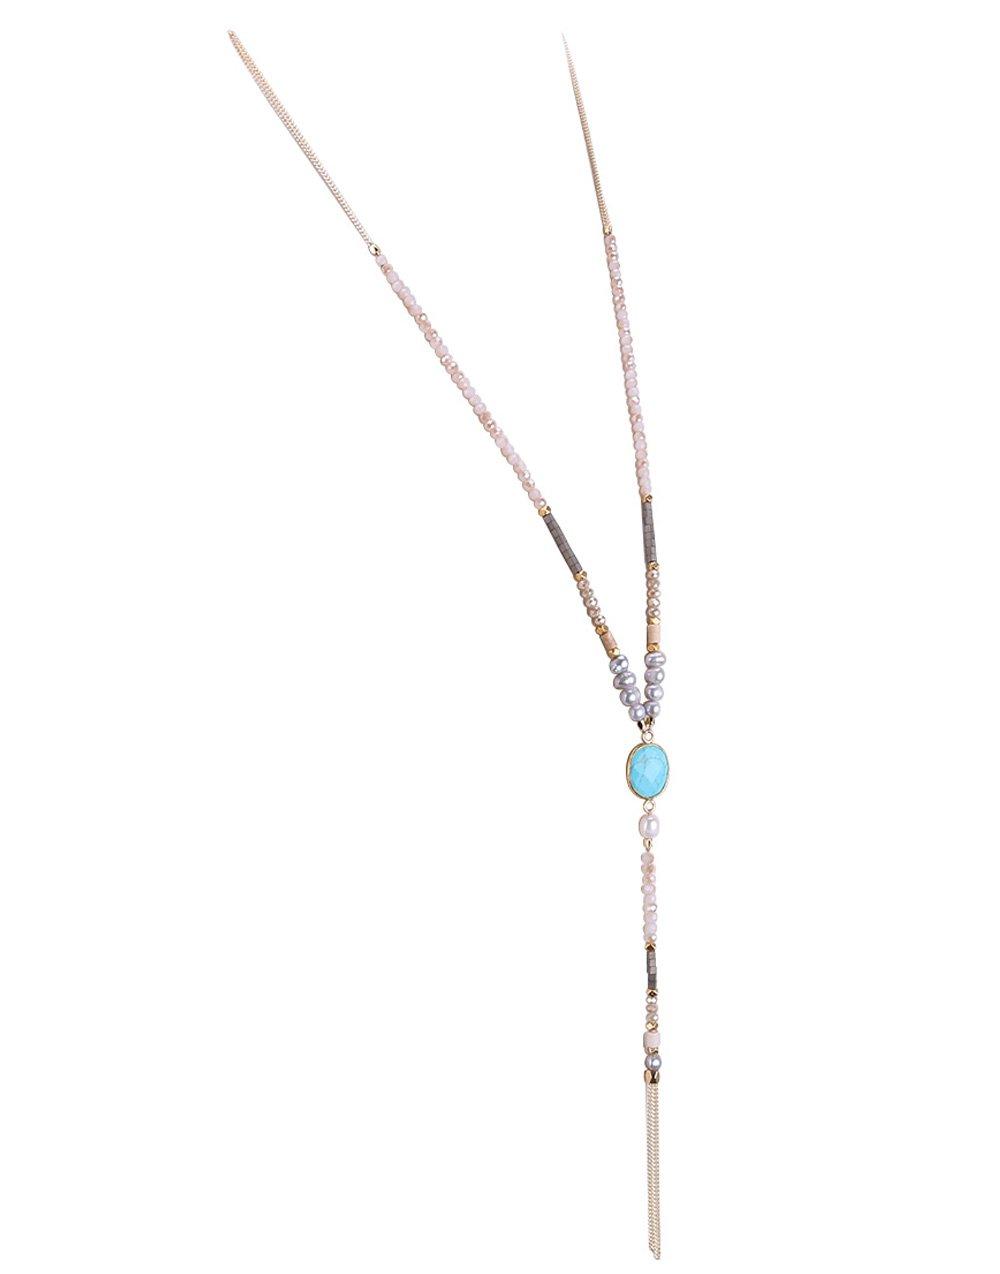 KELITCH Pearl Crystal Beaded Necklace Tassel Gems Pendant Statement Long Necklace for Women AMN0310DK